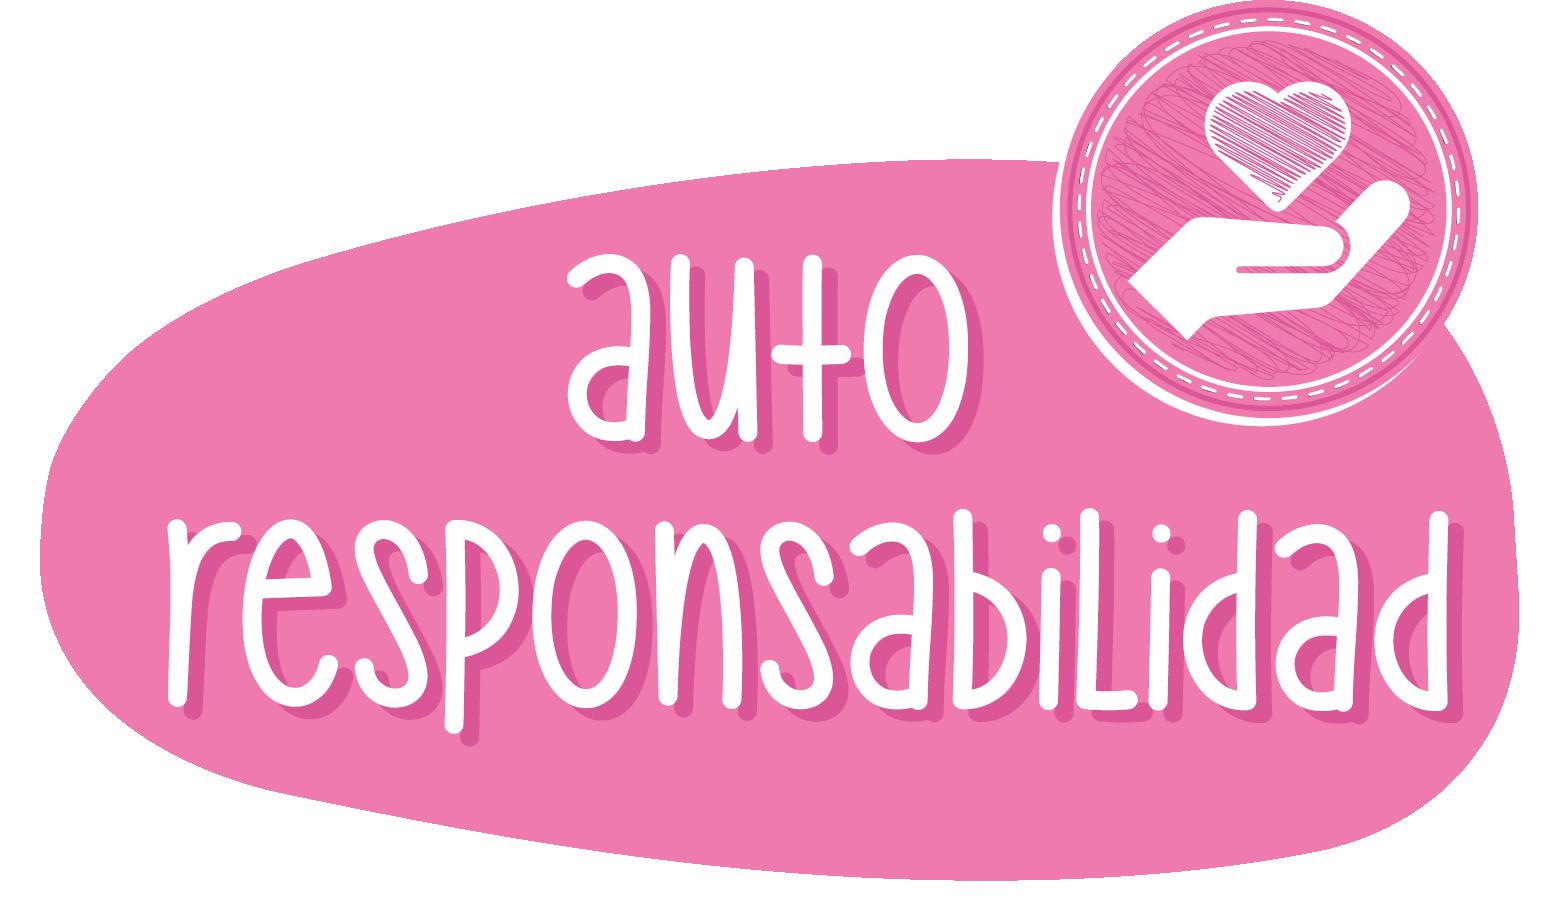 Autoresponsabilidad